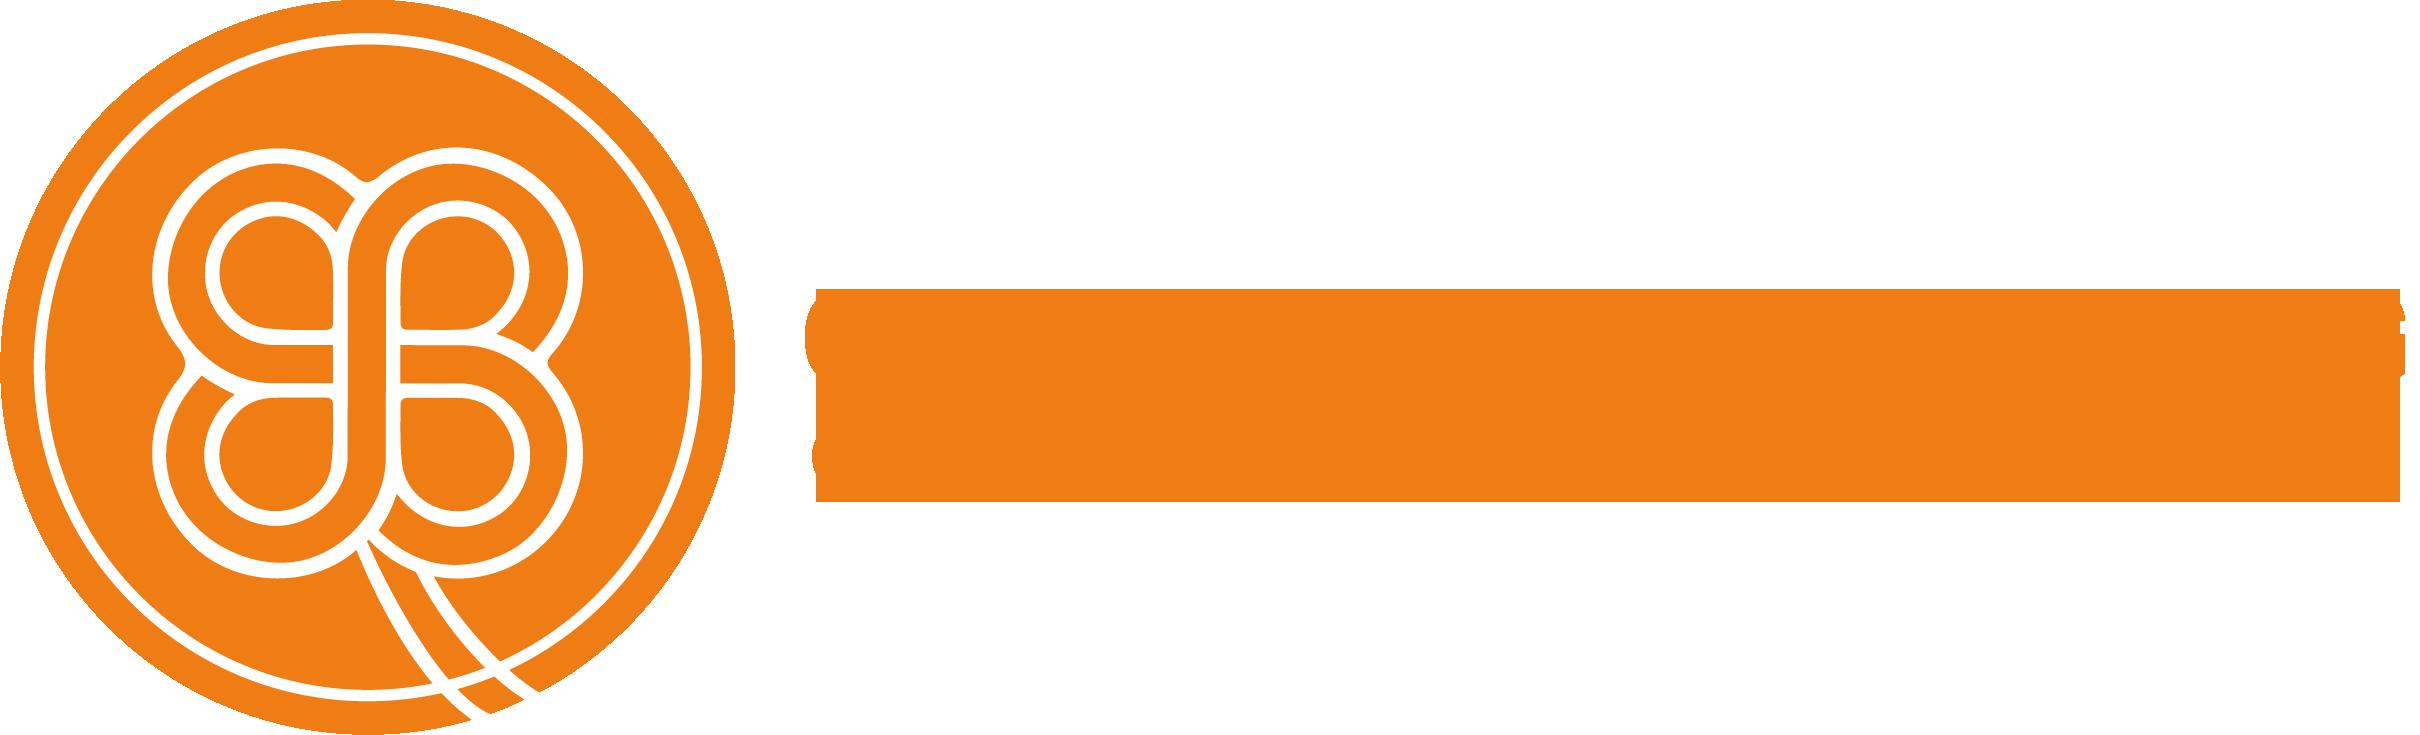 Crossroads Limburg